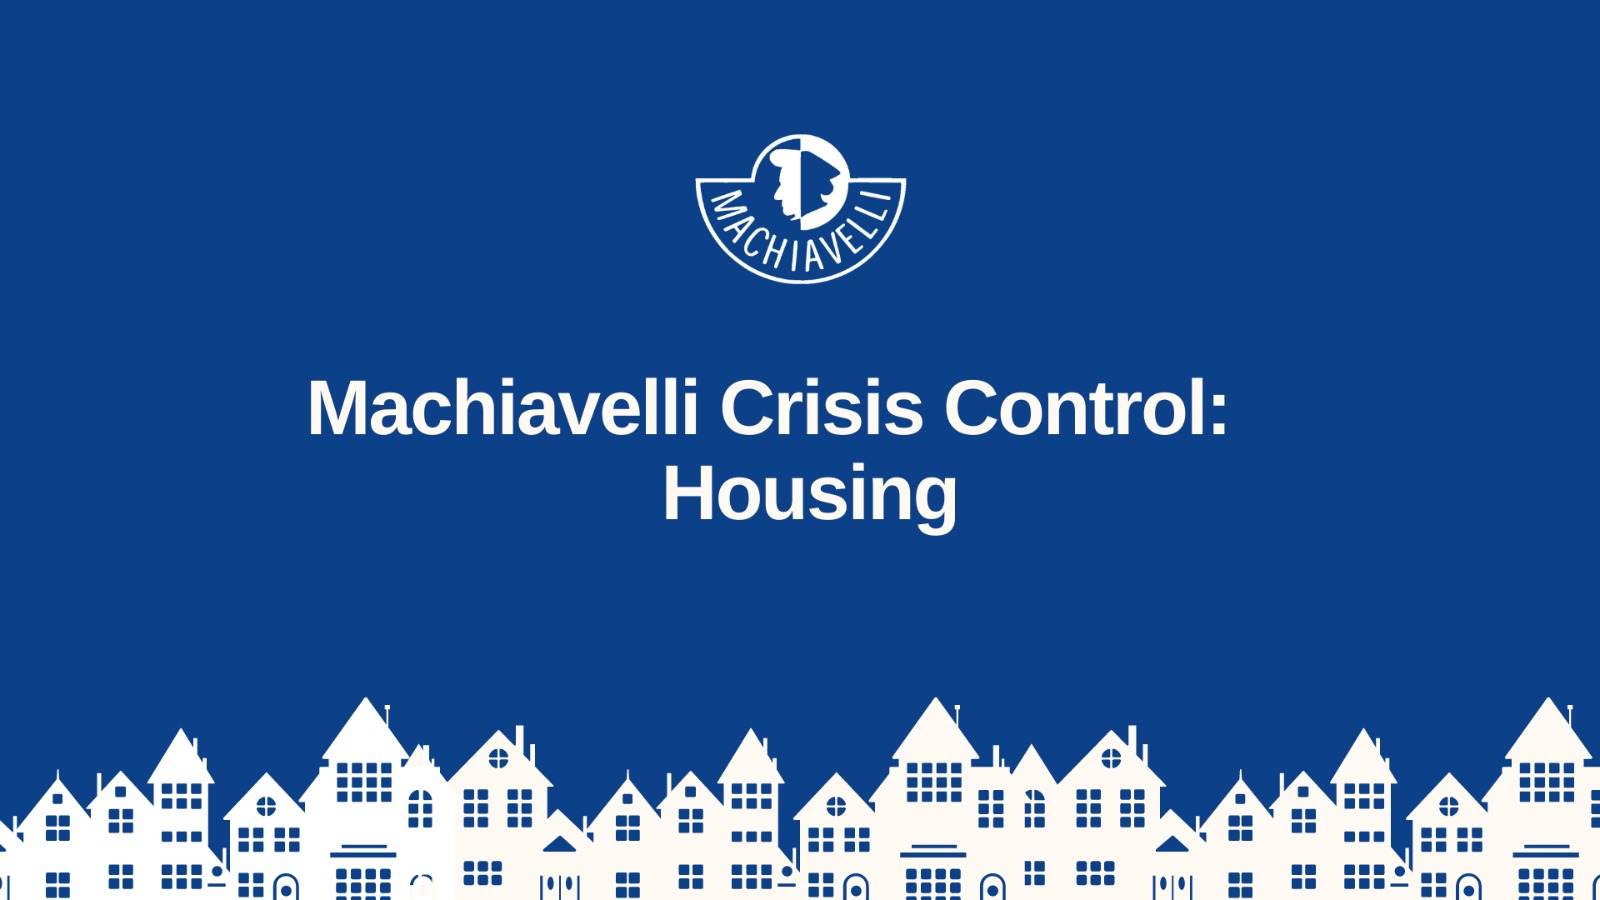 Machiavelli Crisis Control: Housing